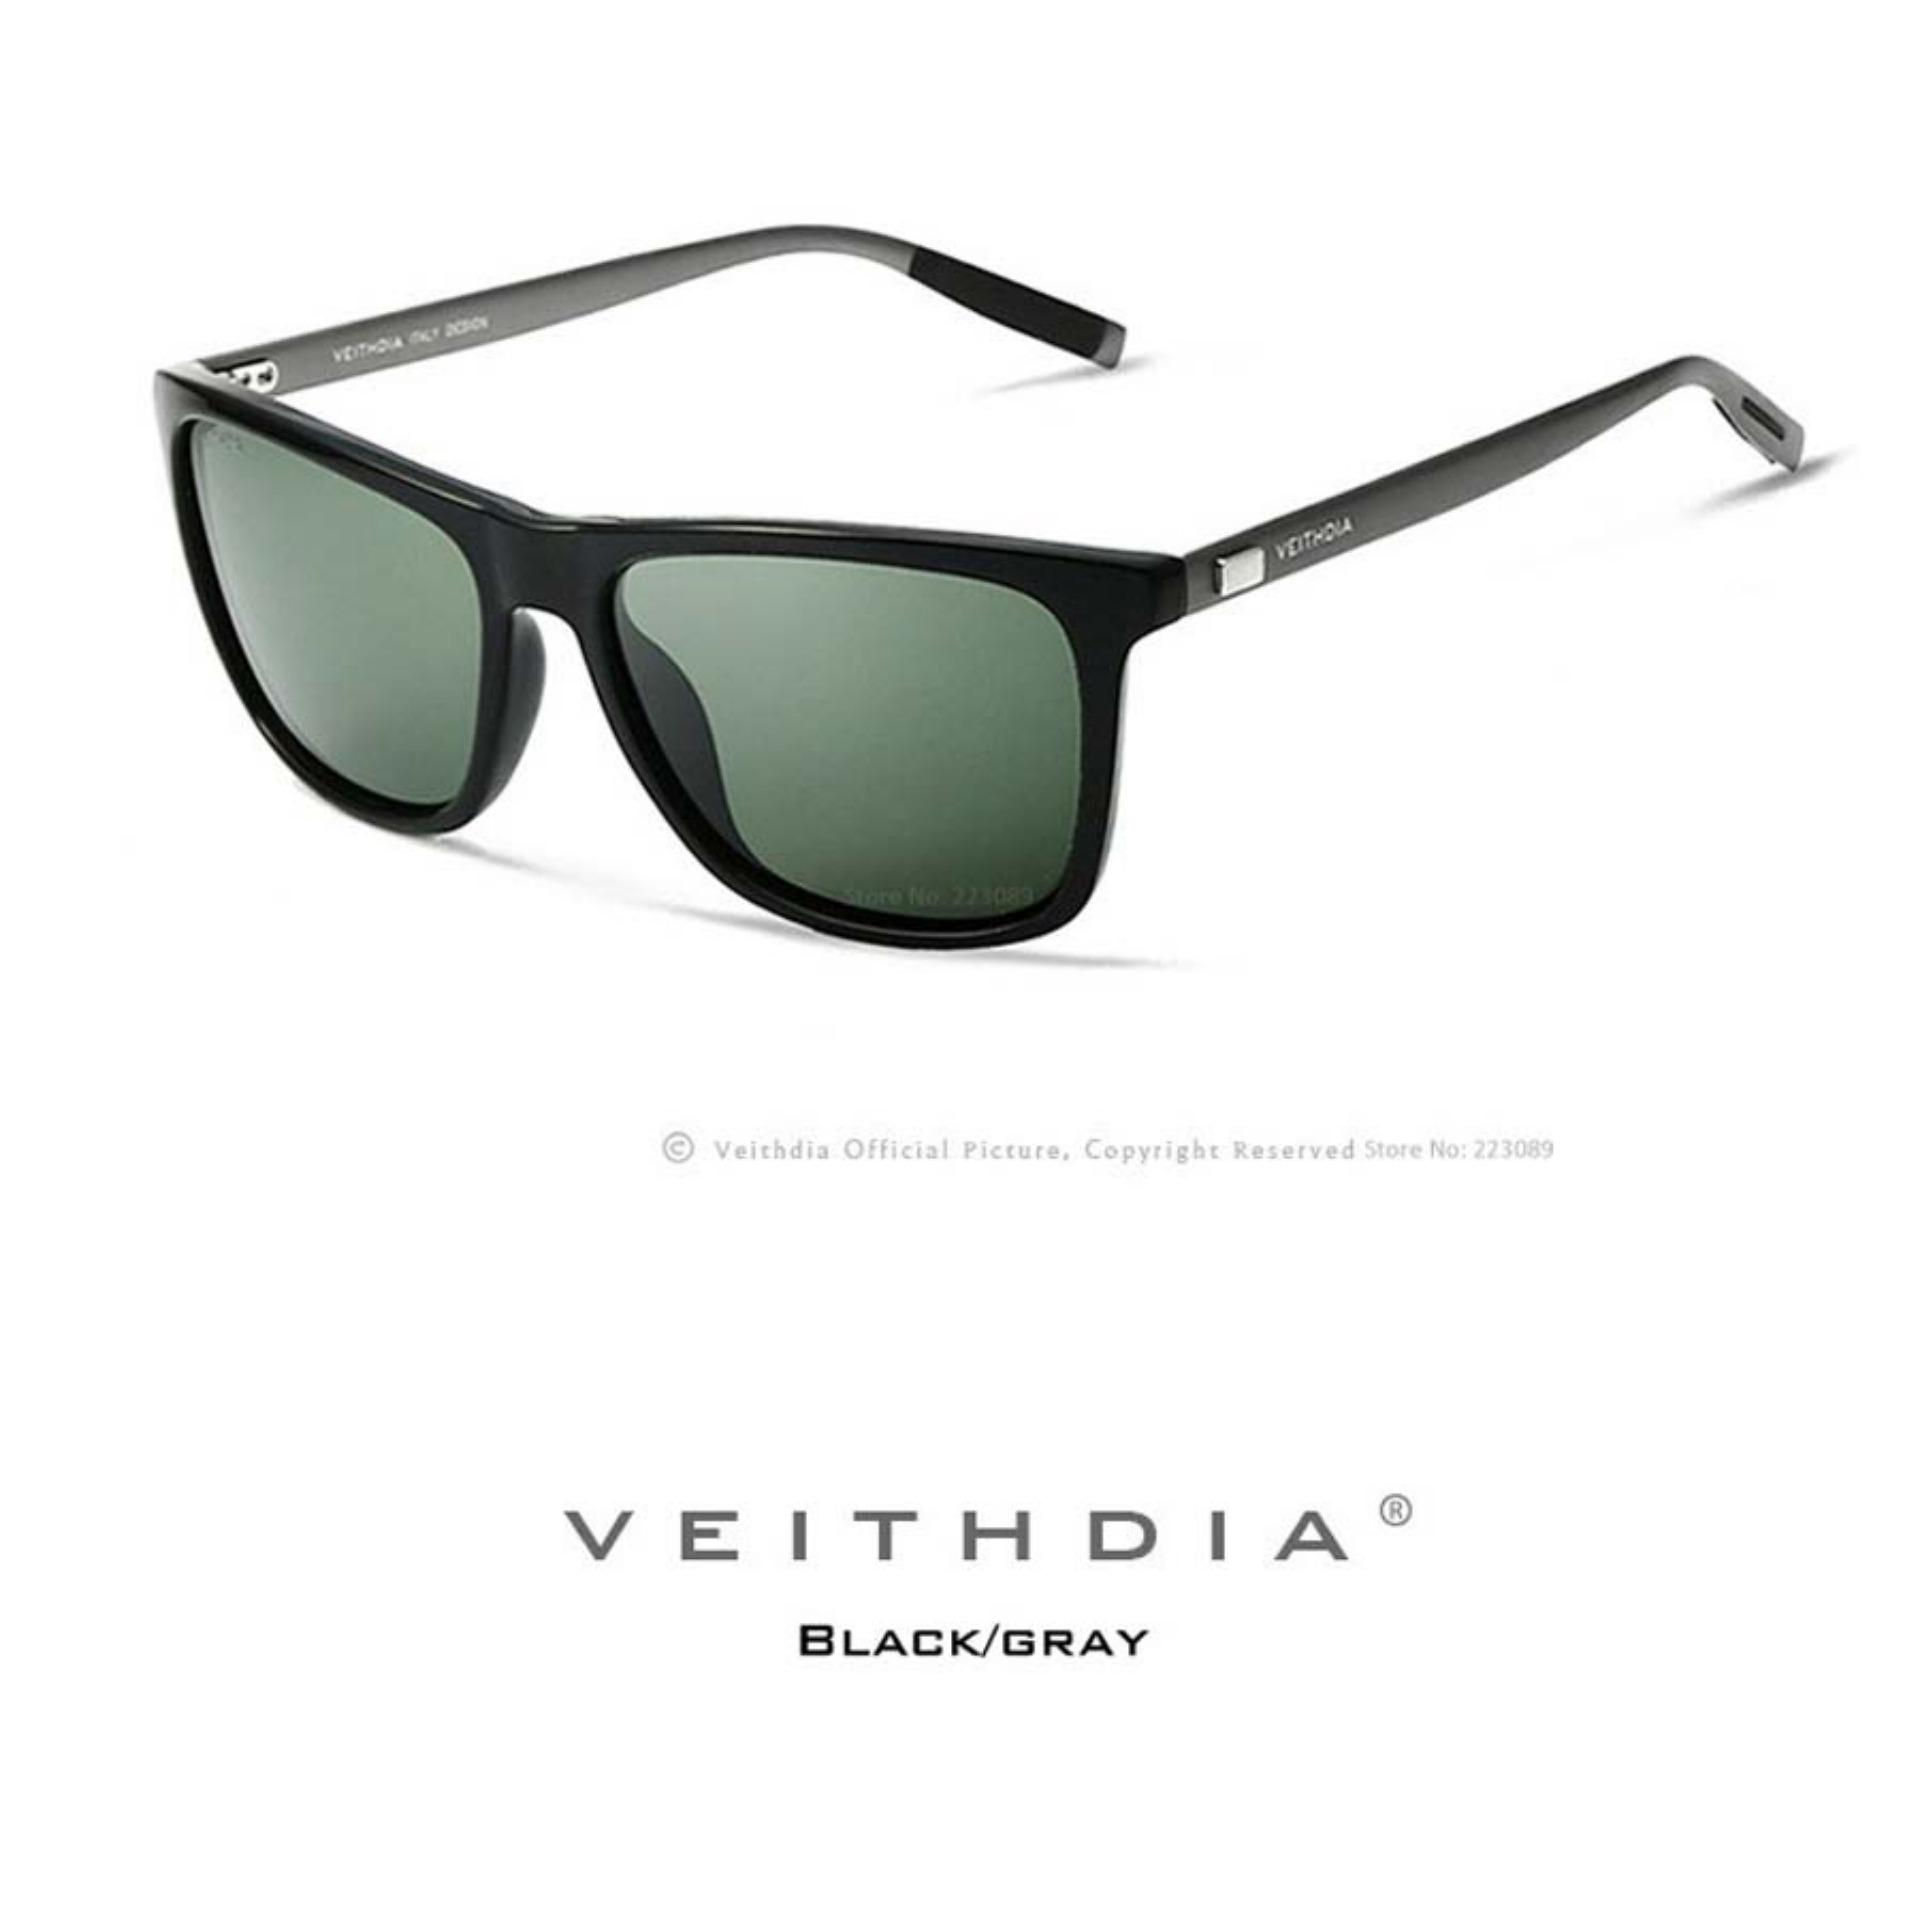 Toko Veithdia 6108 Kacamata Hitam Pria Aluminium Sport Dan Travel Elegant Mirrored Uv400 Polarized Sunglasses Veithdia